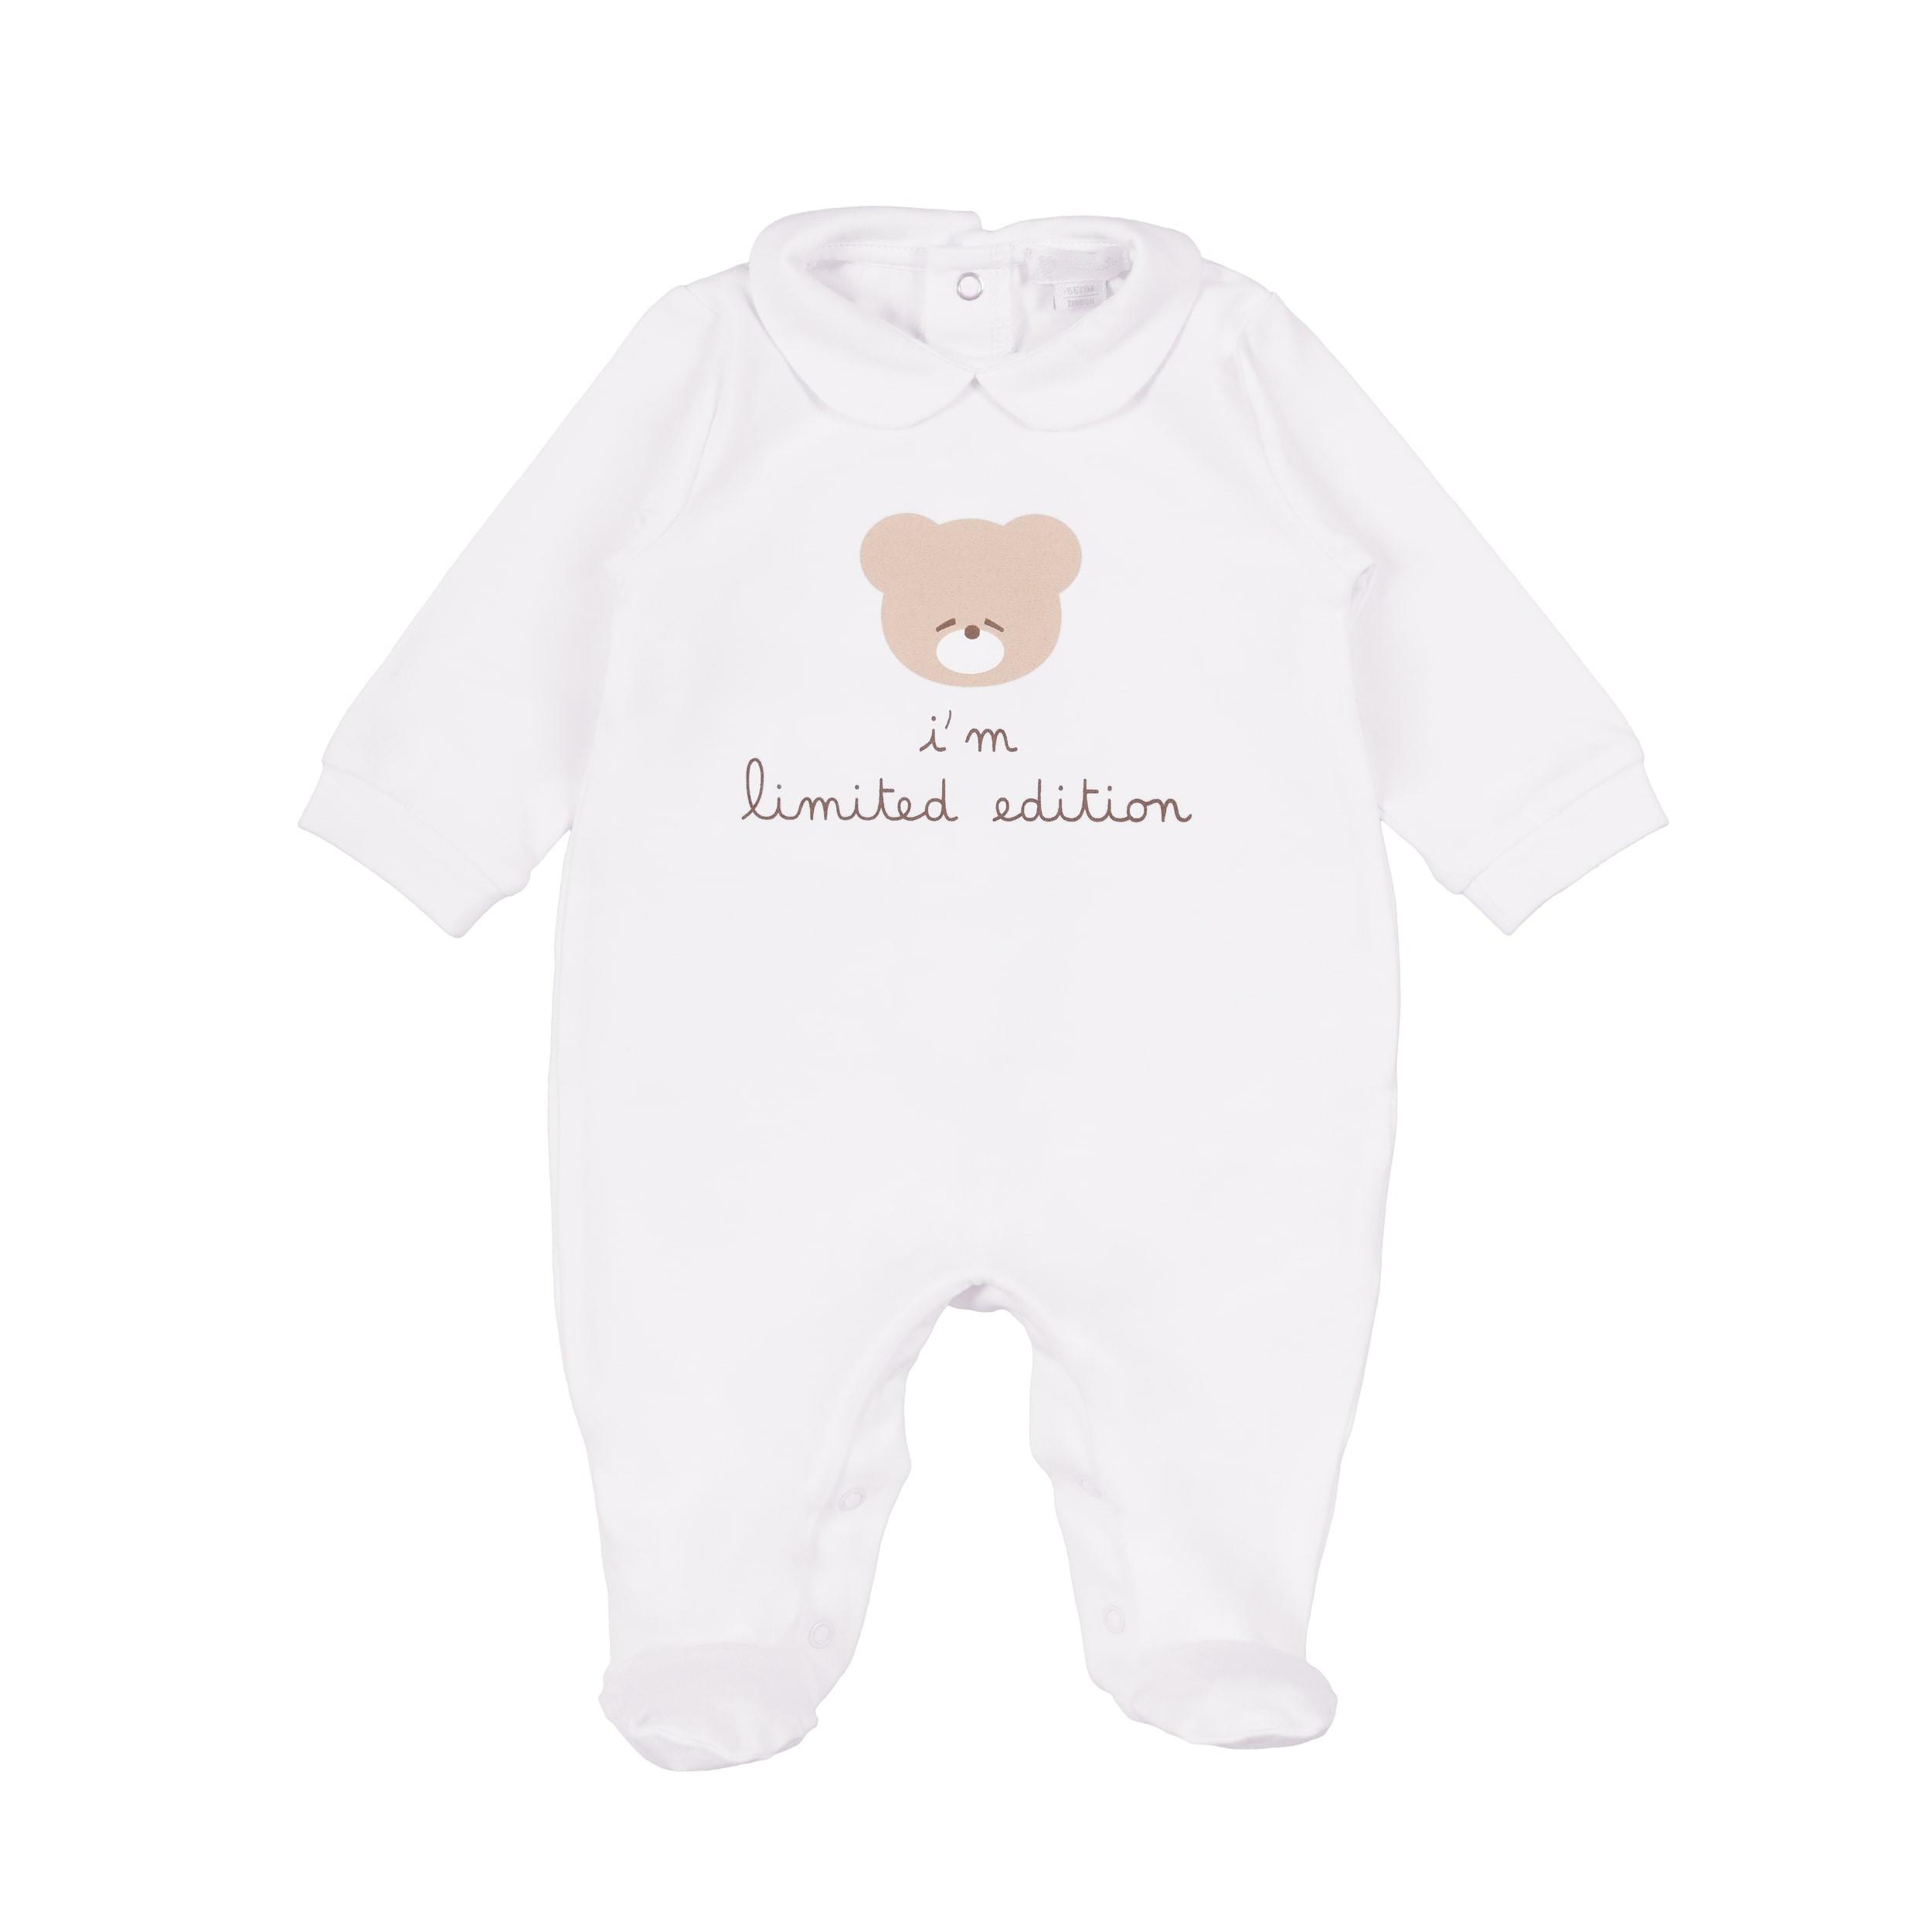 Pyjama - I'm limited Edition